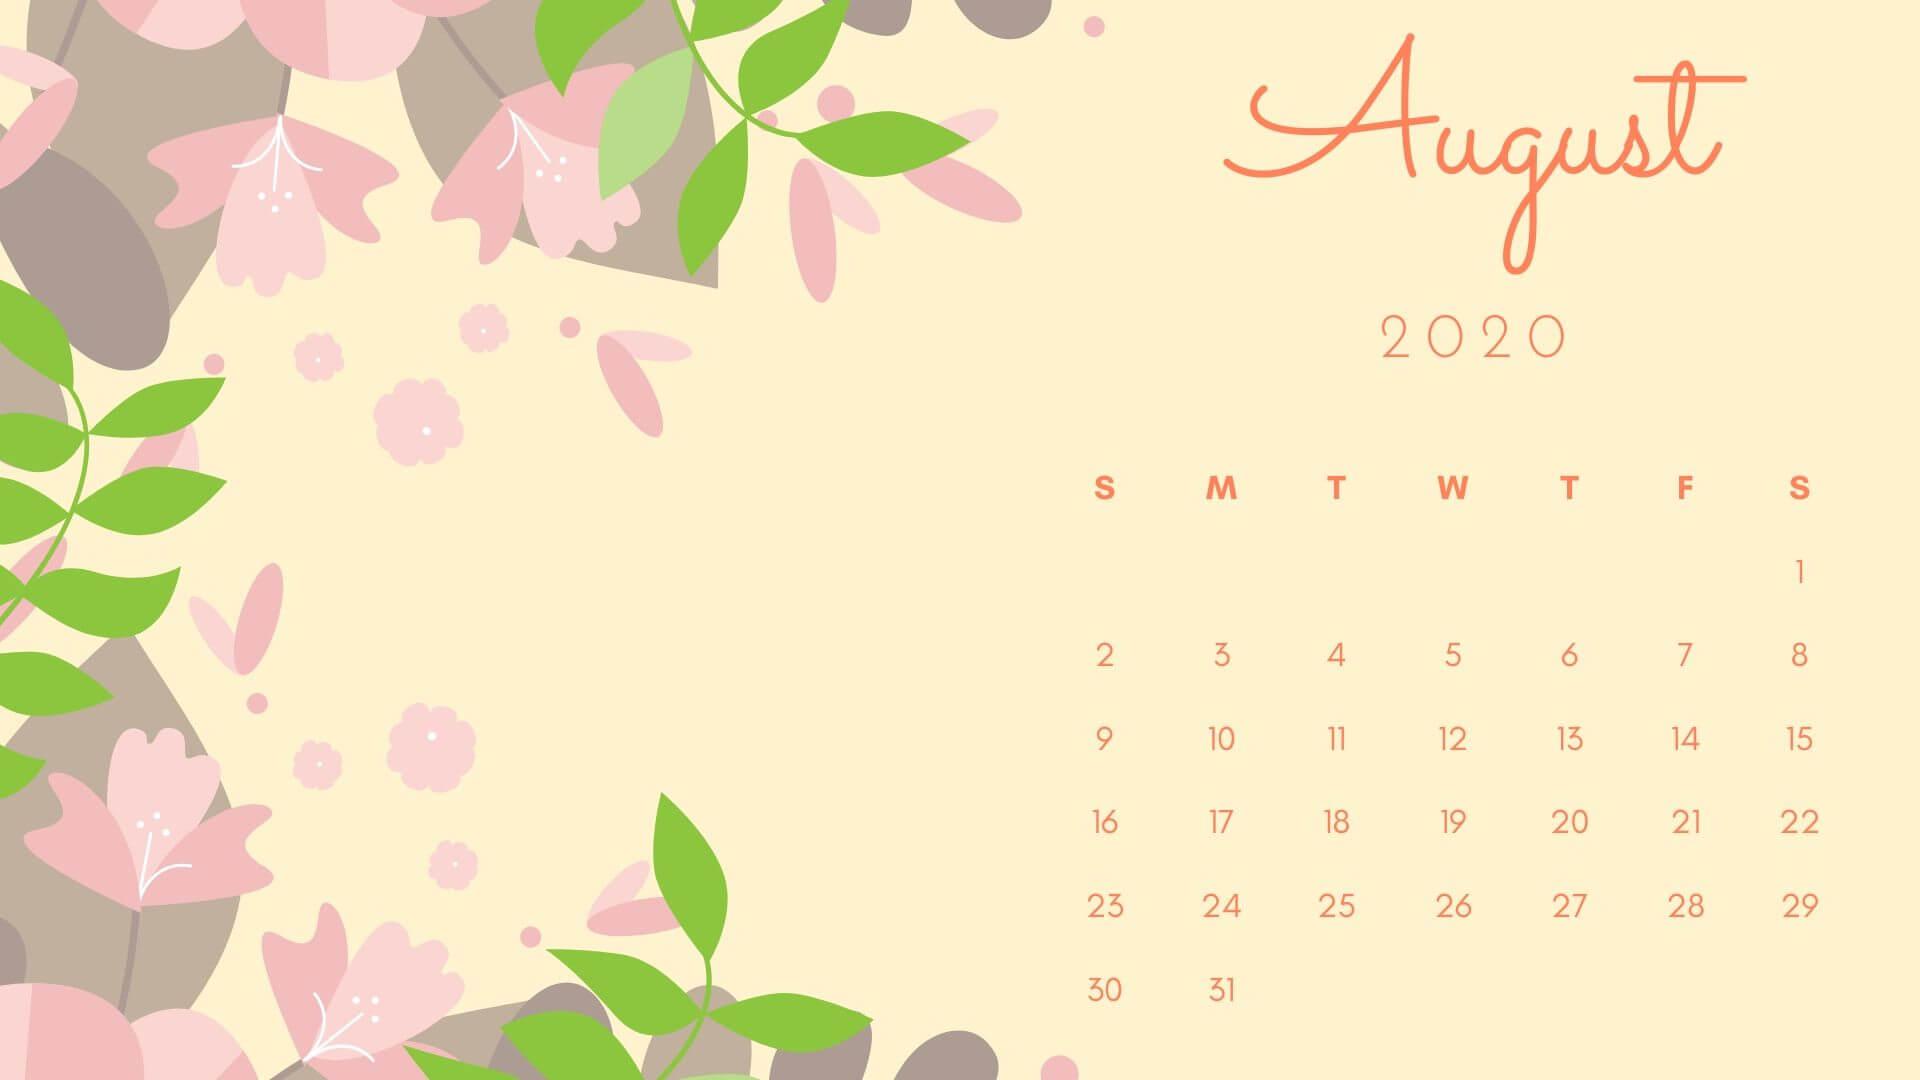 August 2020 Floral Desktop Wallpaper